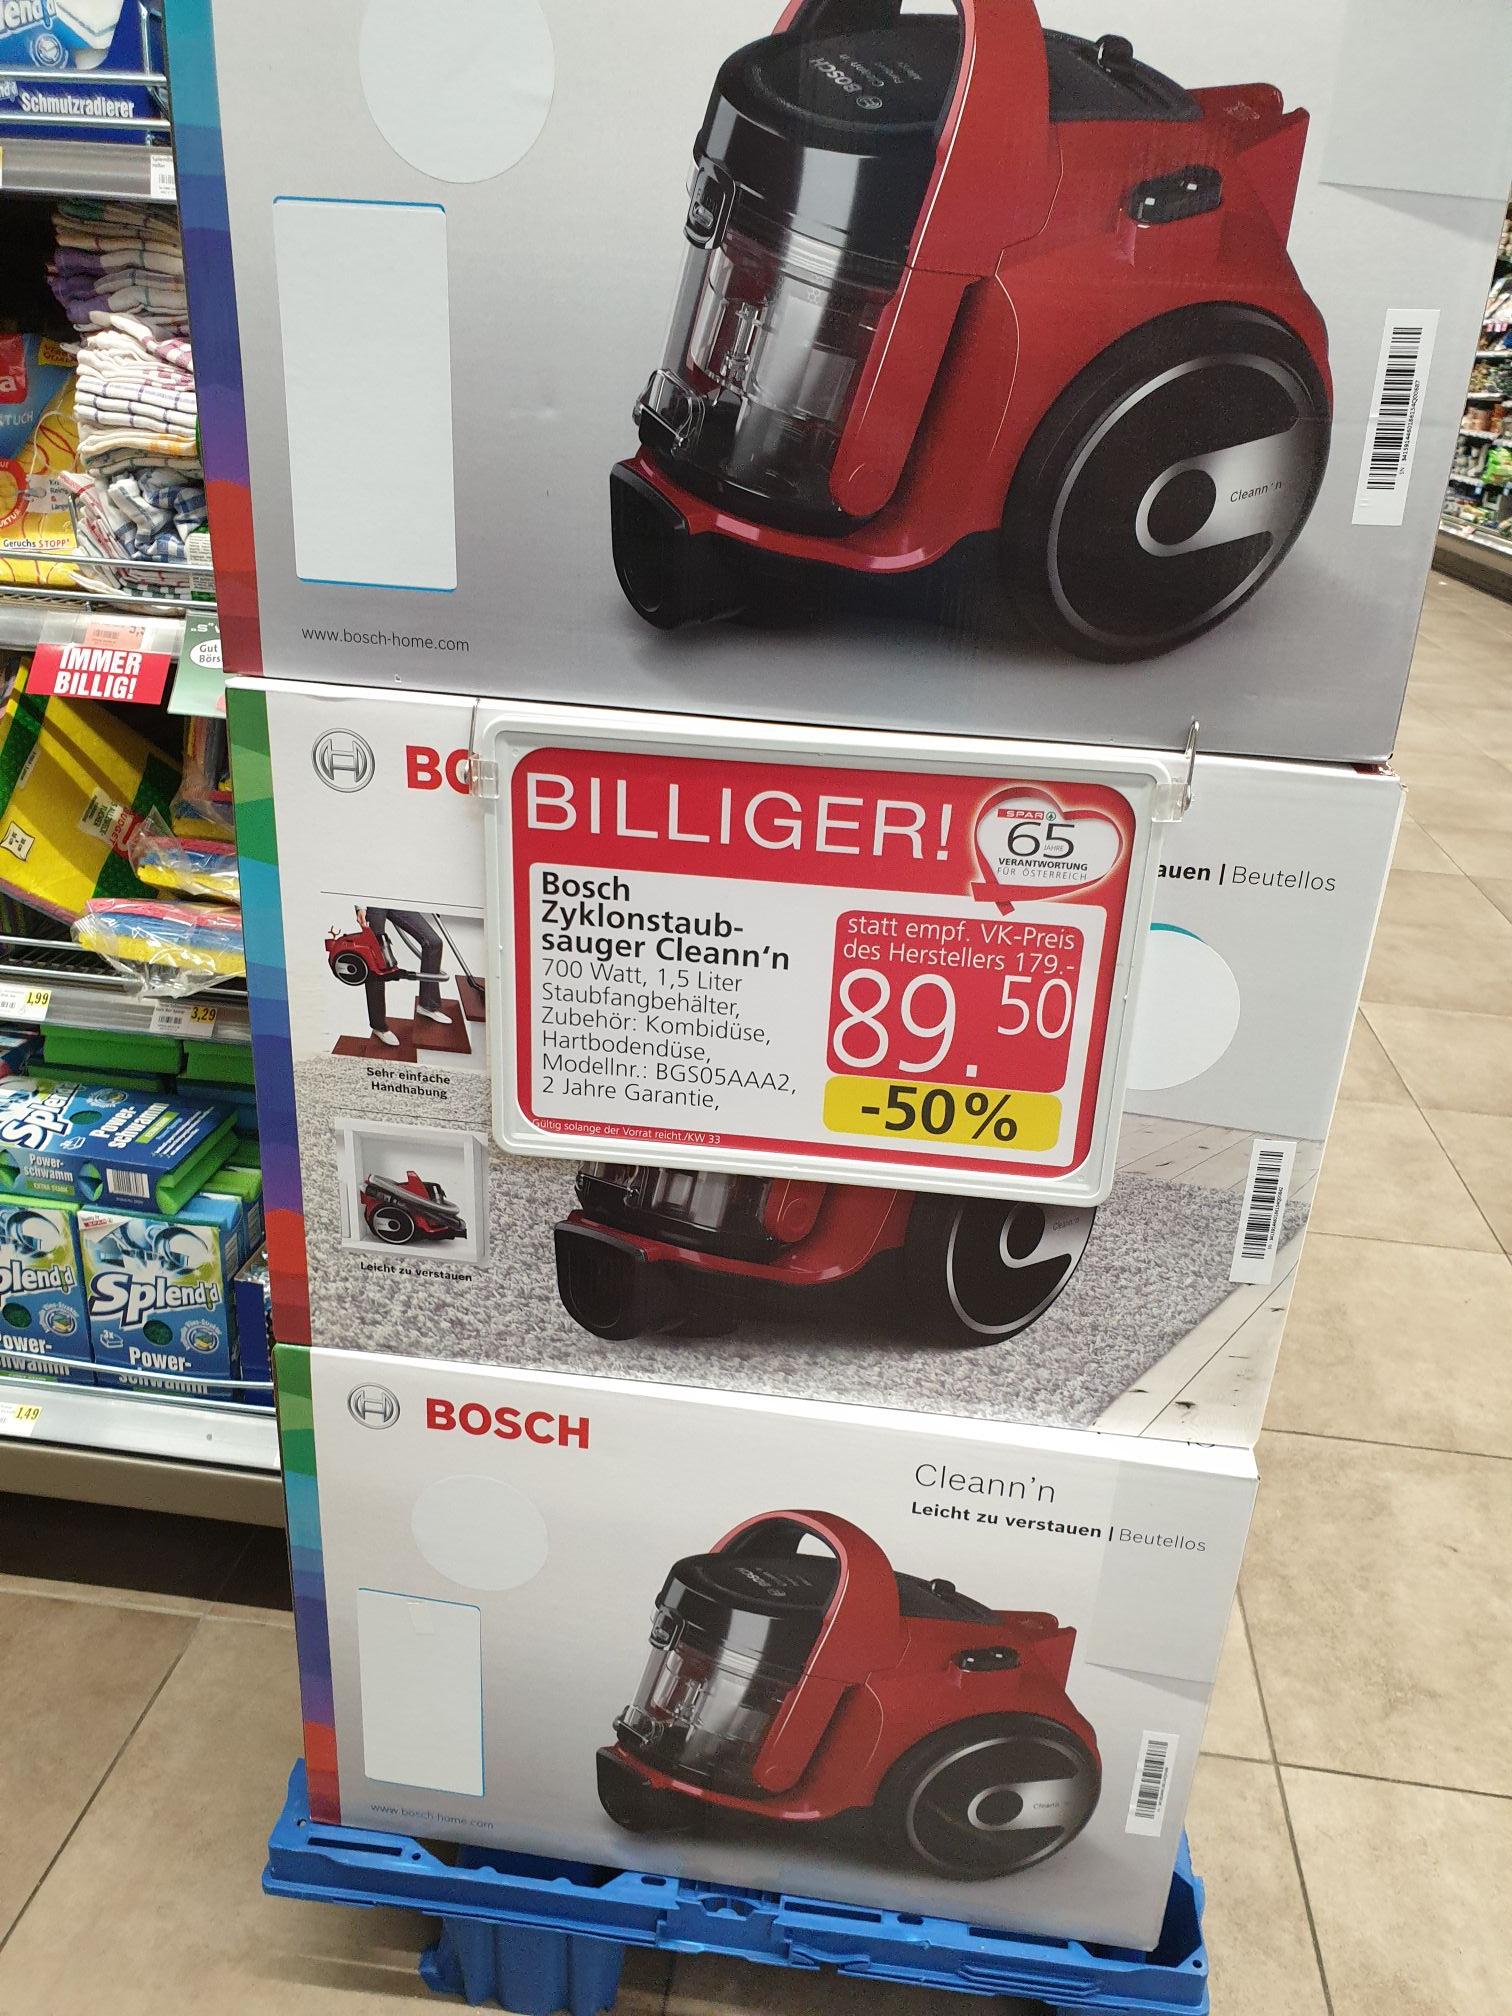 Bosch Zyklonstaubsauger